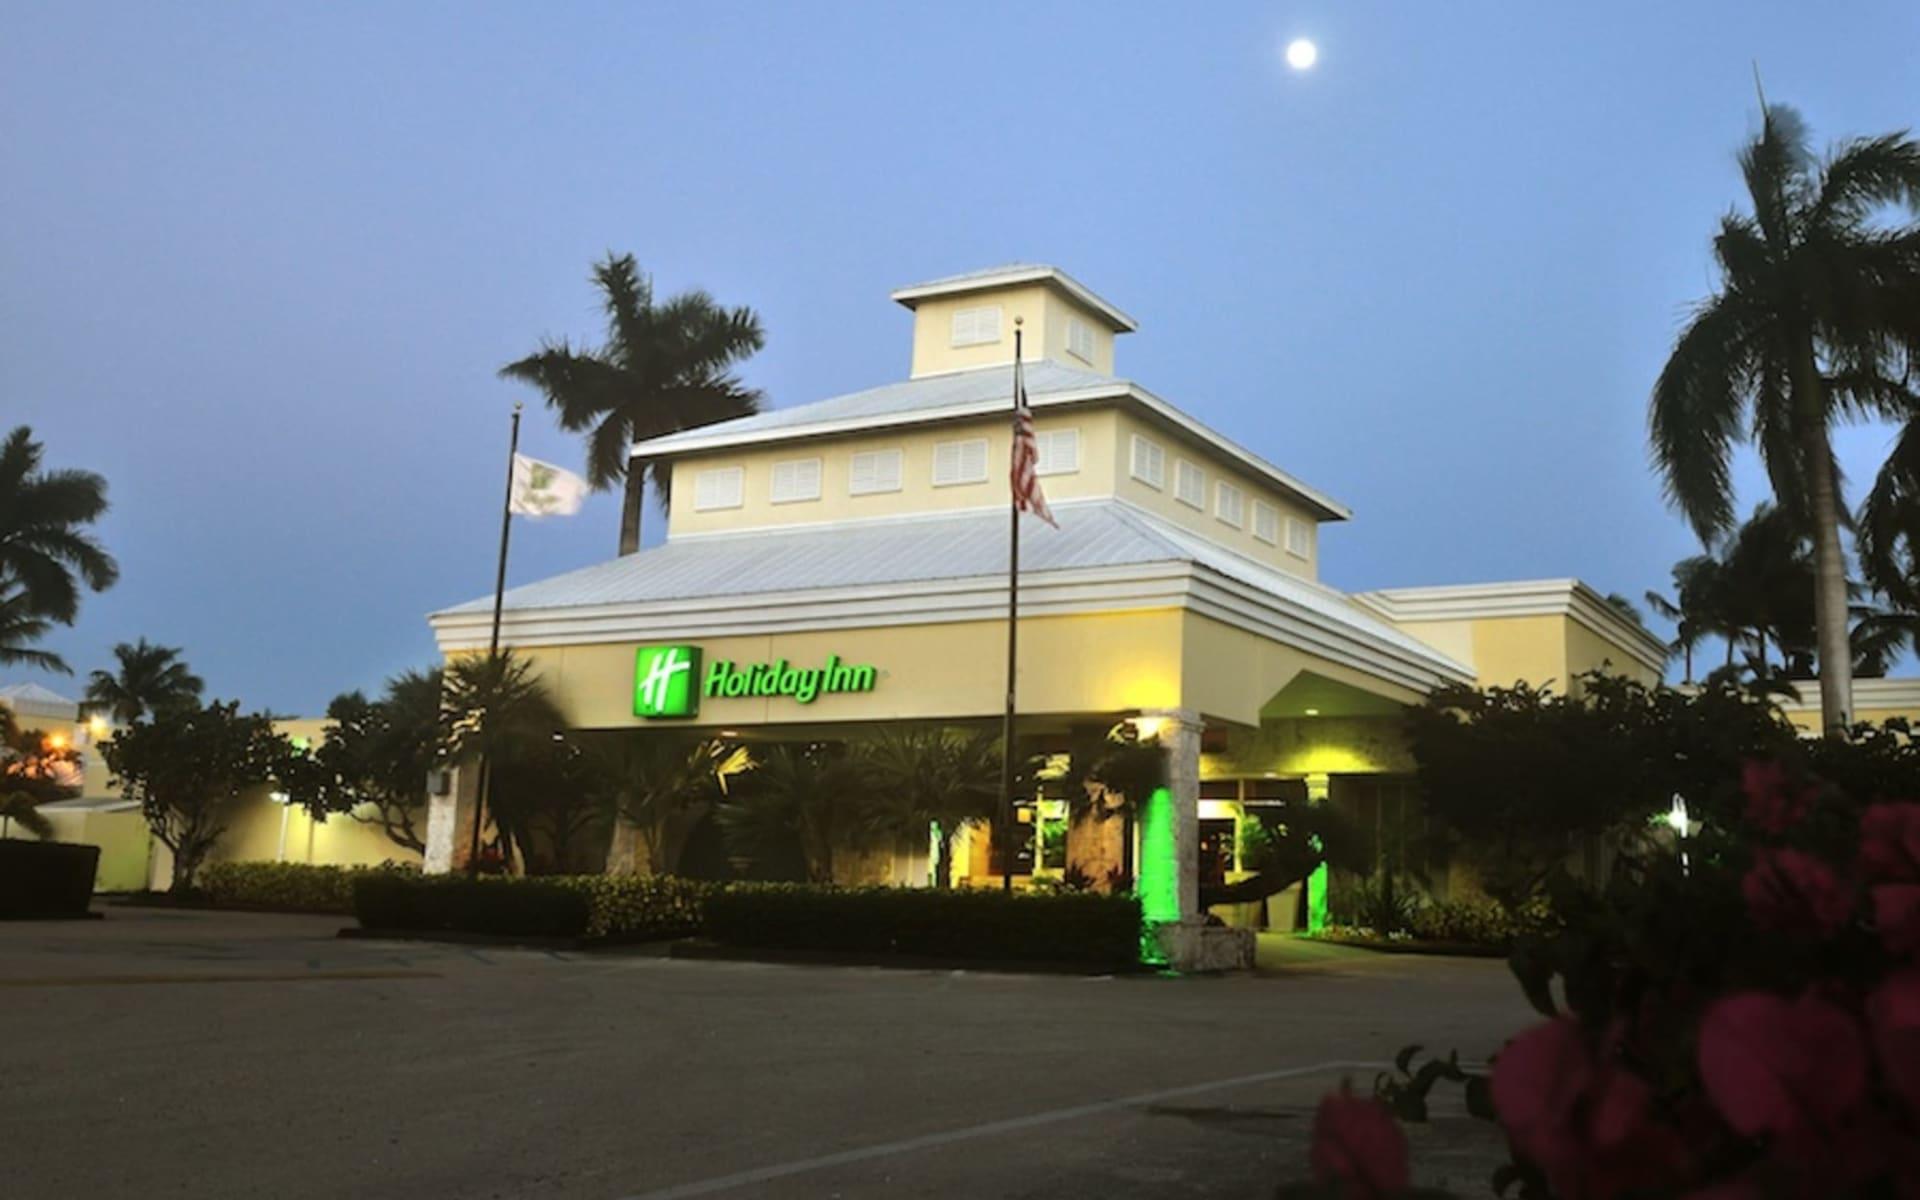 Holiday Inn Key Largo:  Holiday Inn Key Largo - Hotel by night